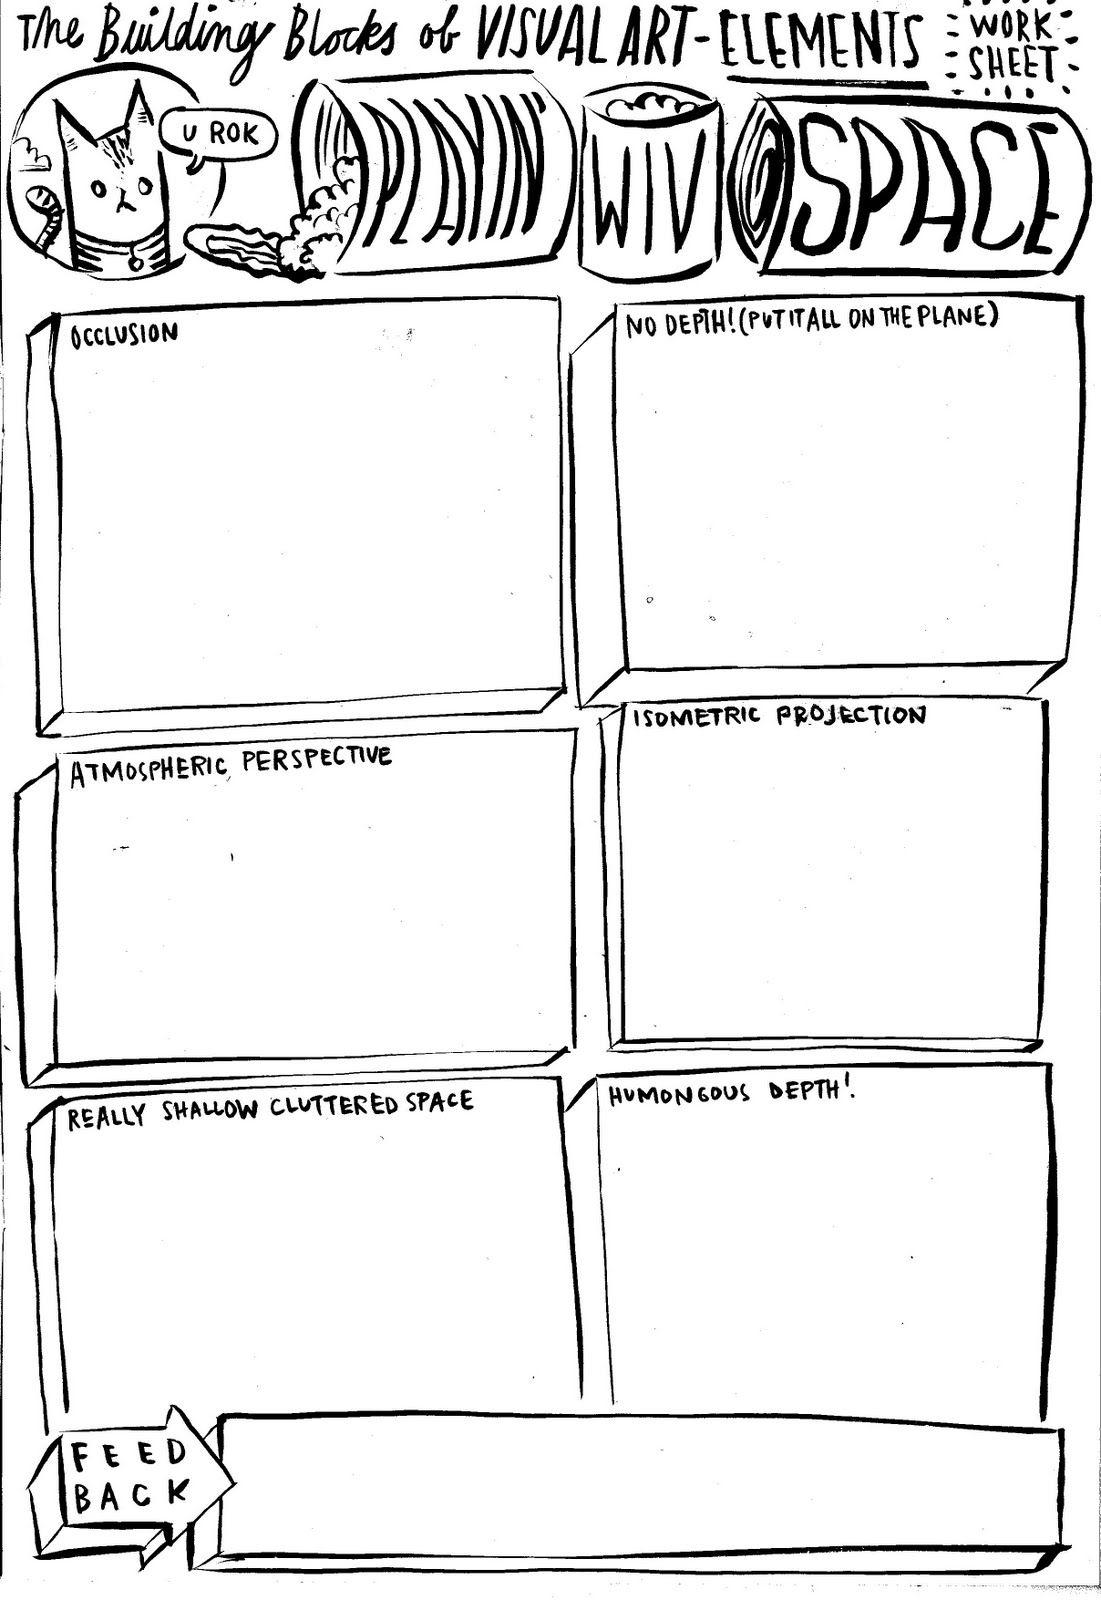 Dan Haycocks Space Sheet Art Basics Art Worksheets High School Art Lessons